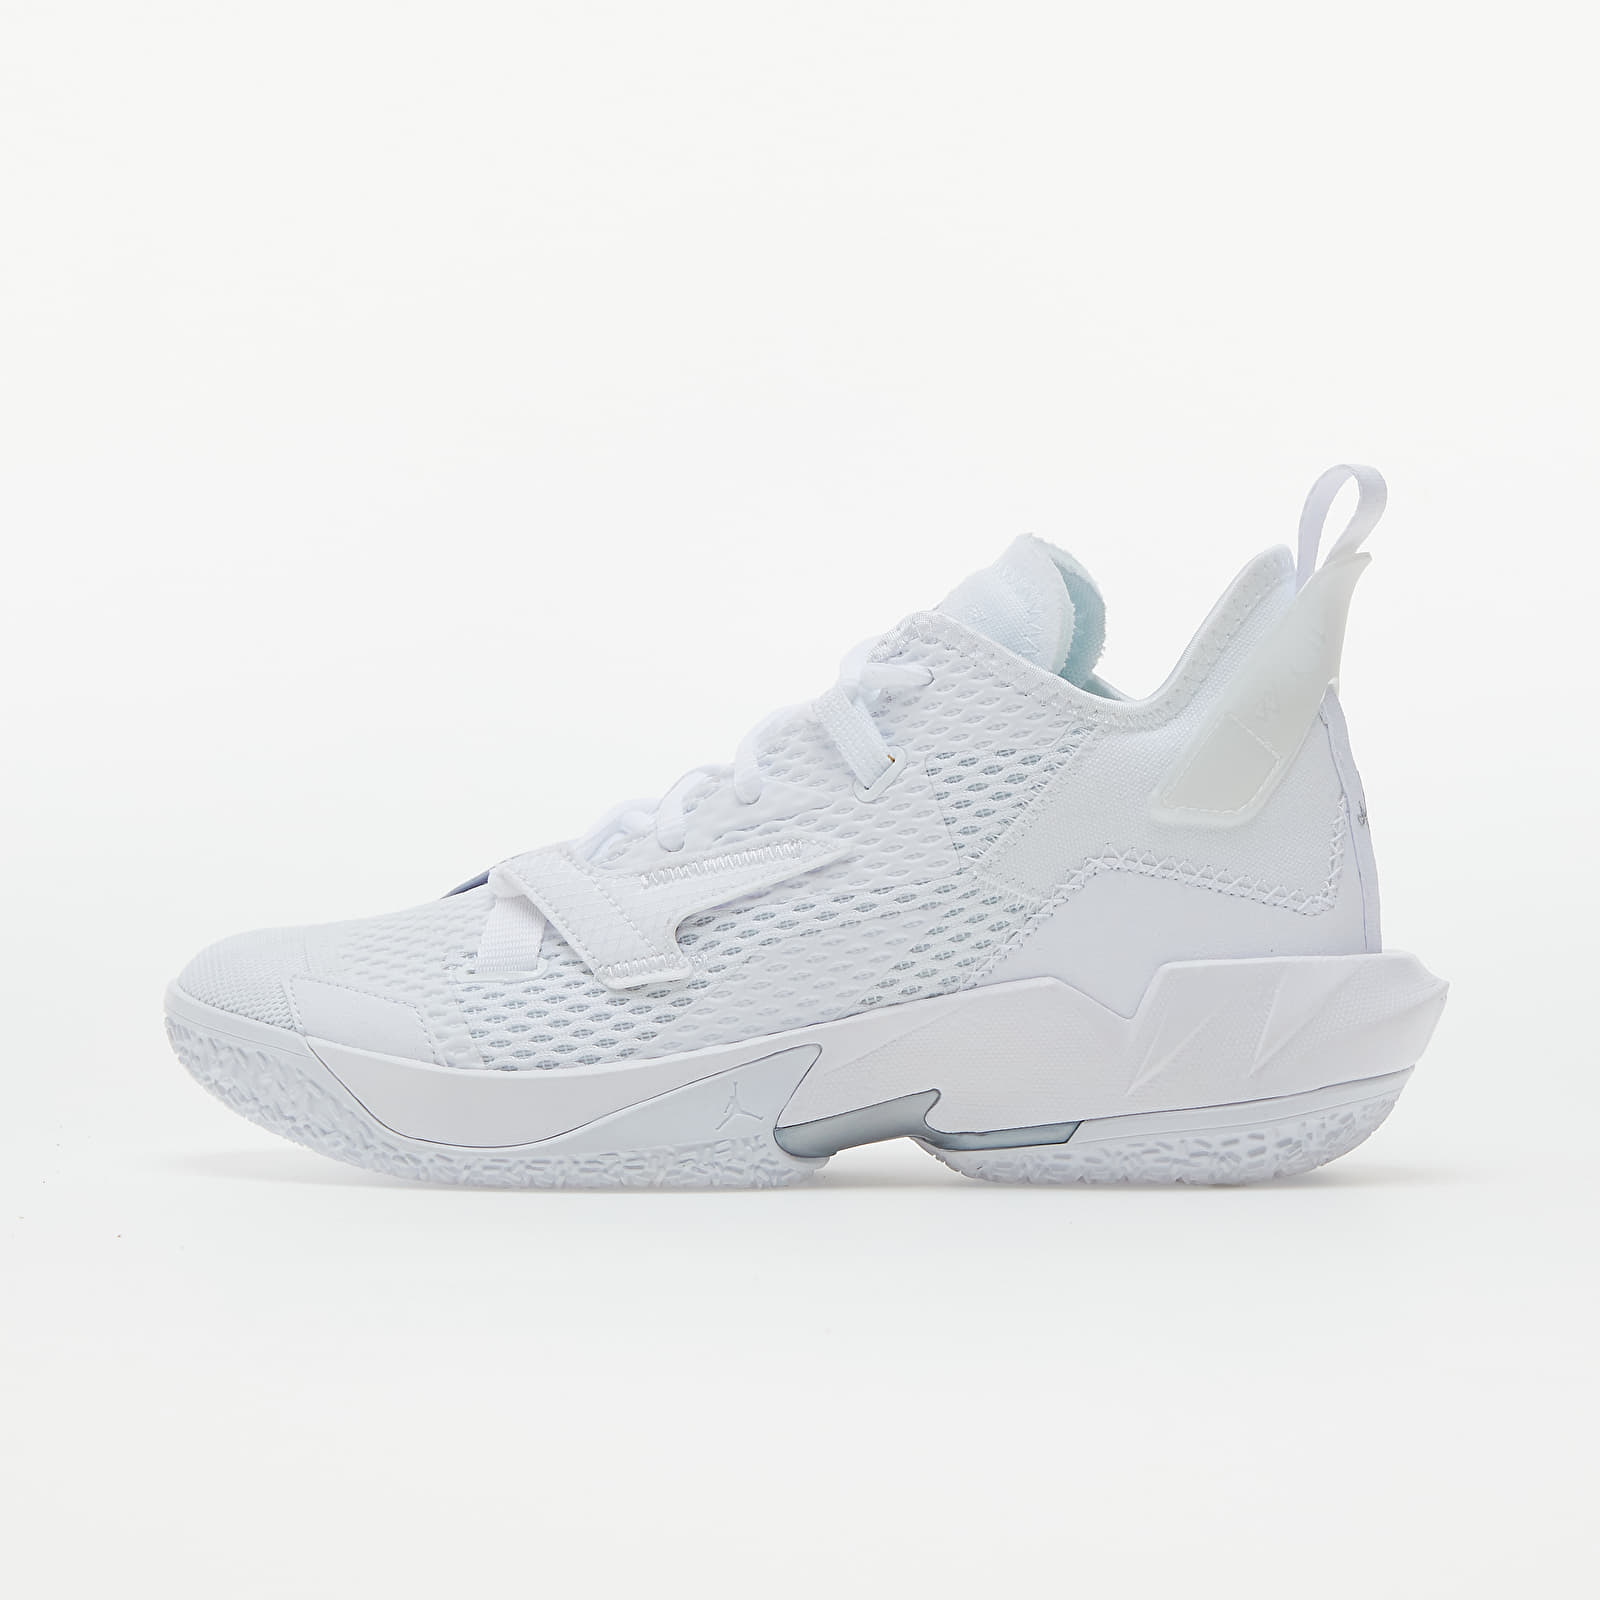 Jordan 'Why Not?' Zer0.4 White/ Metallic Silver-White